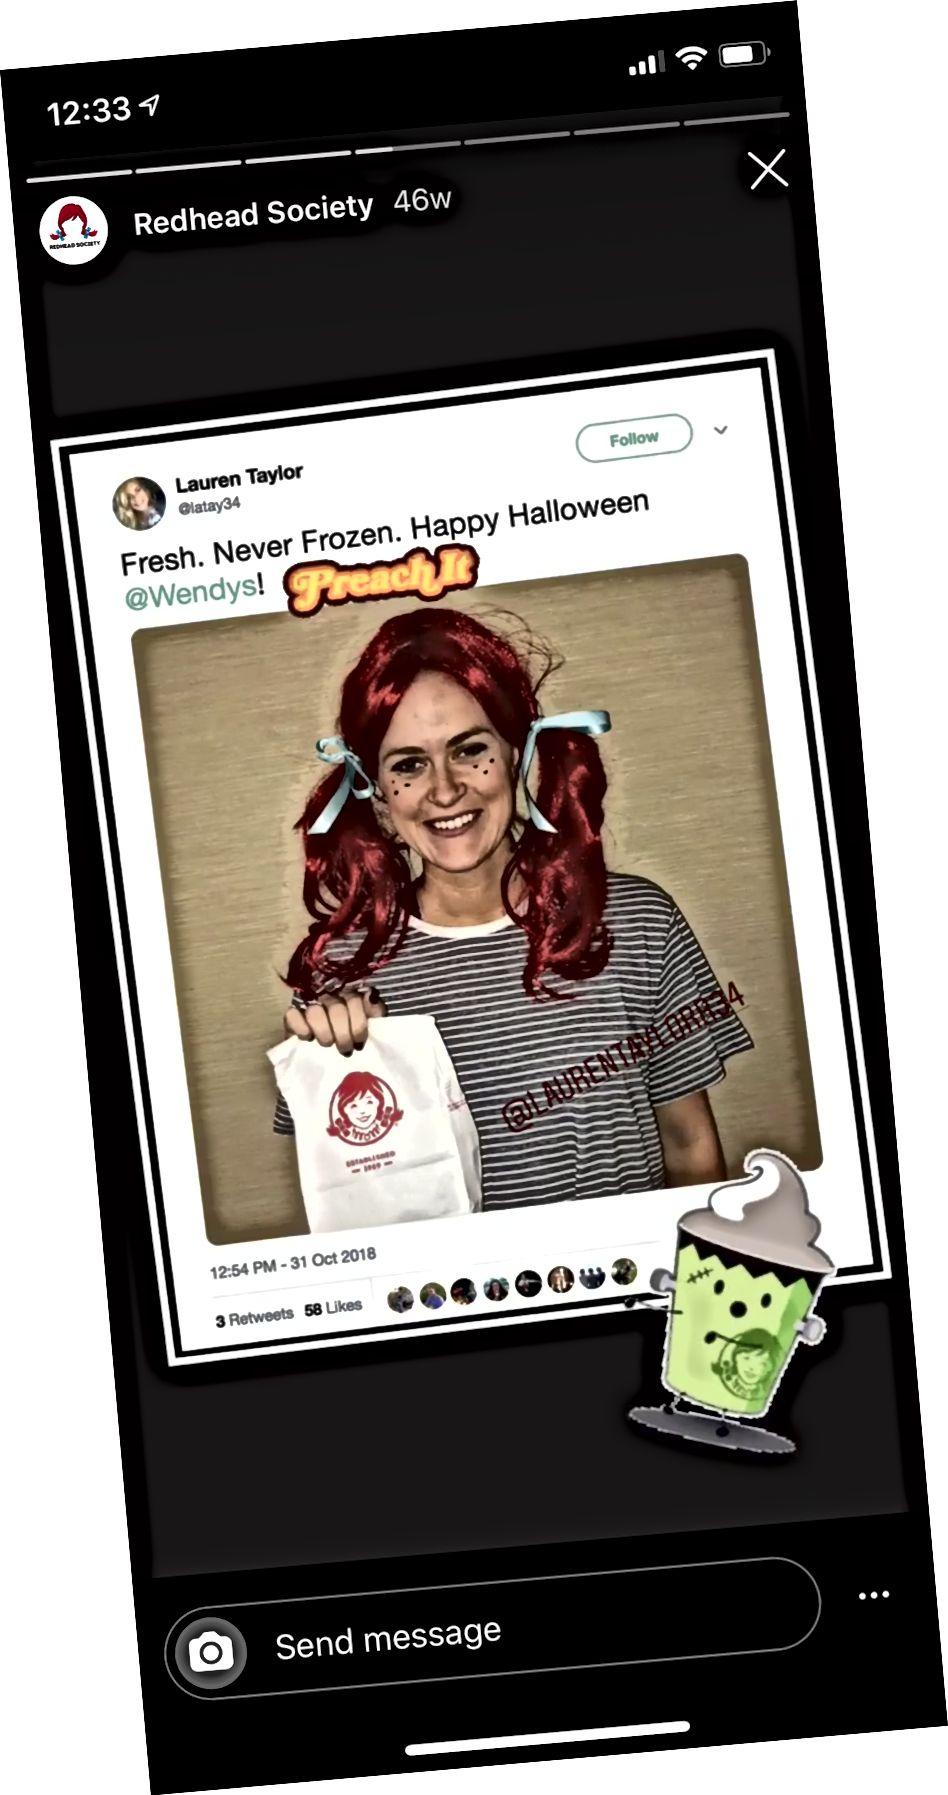 Instagram Stories fremhæver 'Redhead Society' af @wendys